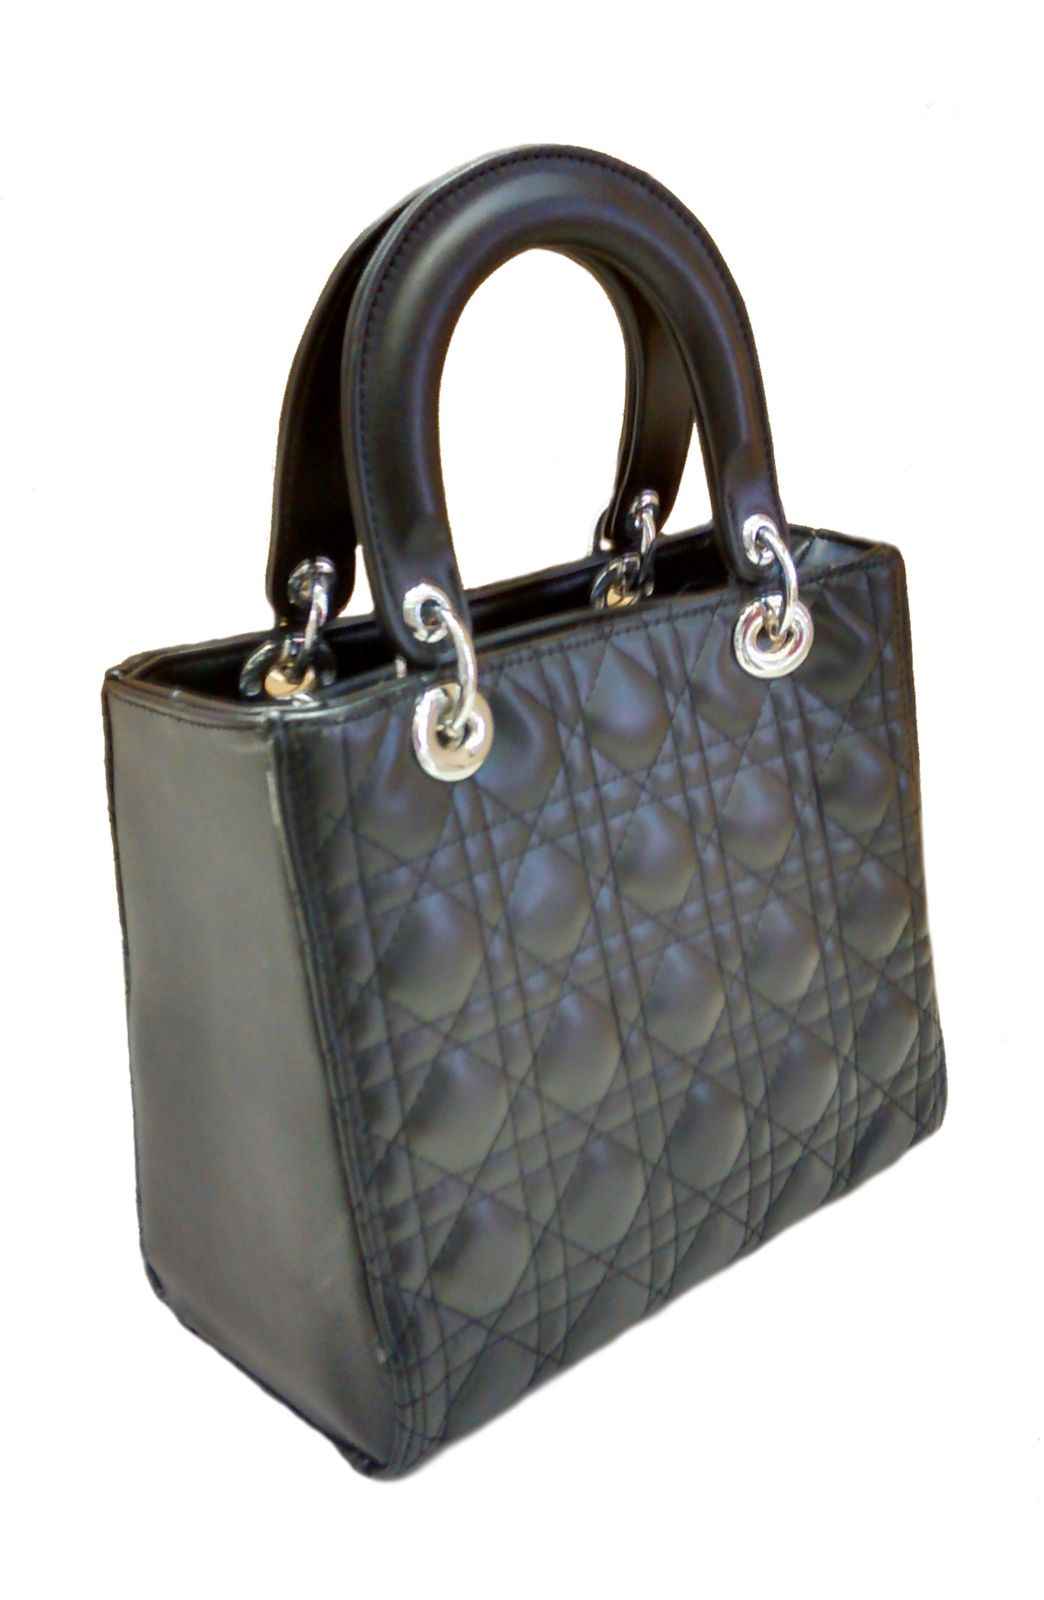 Real Small Bag Black Matelassê Art